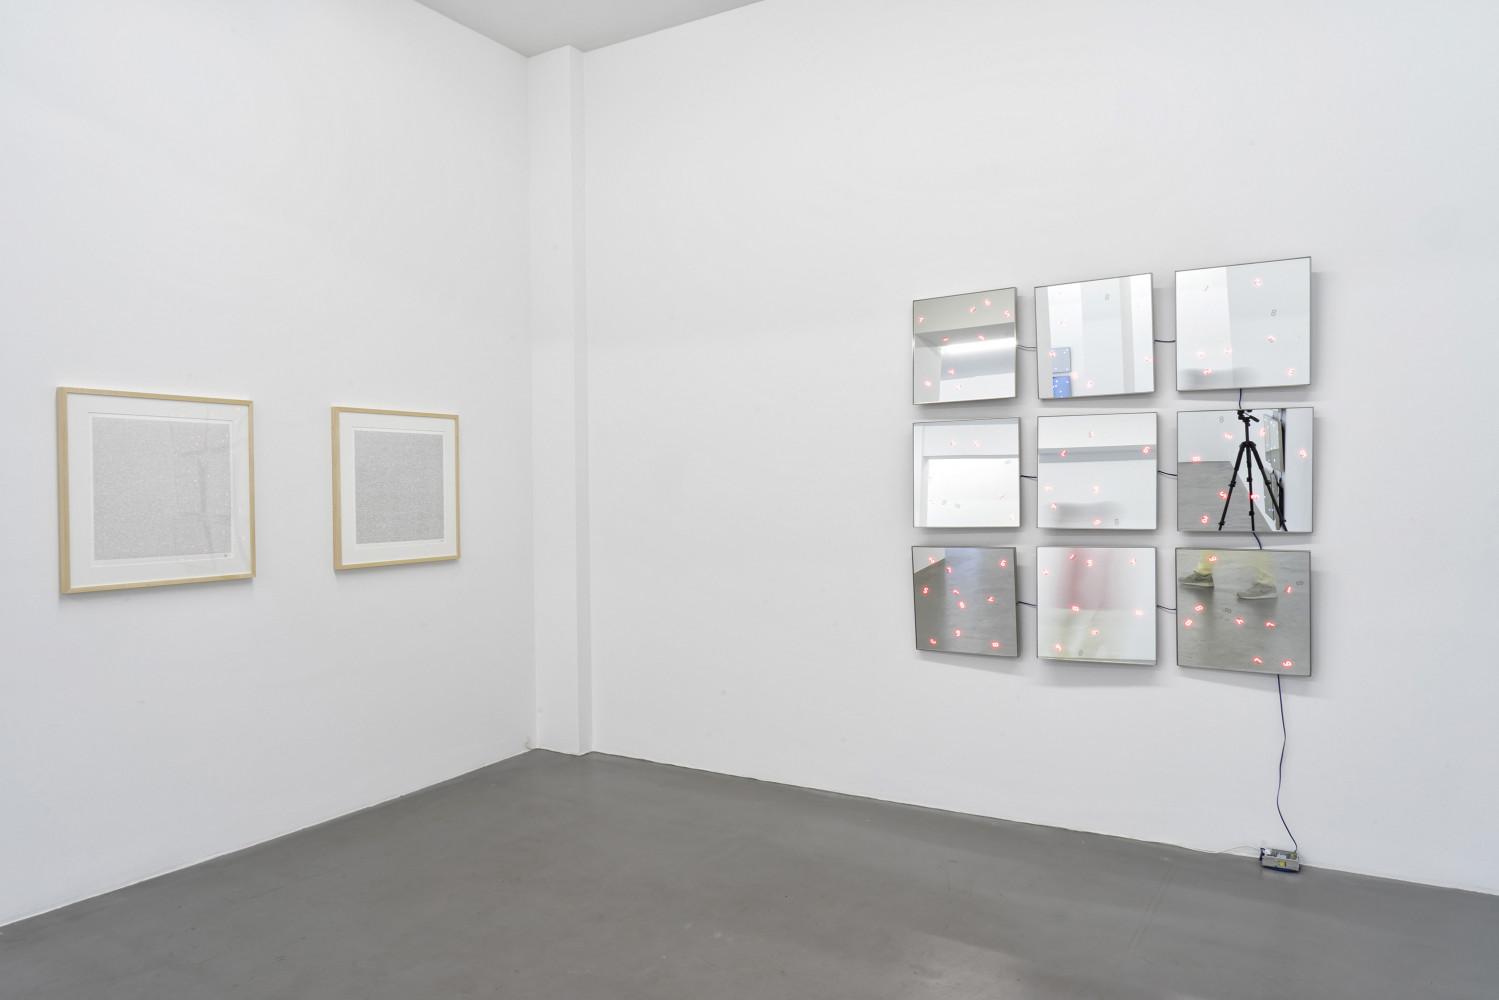 Tatsuo Miyajima, 'Flower Dance', Installation view, Buchmann Galerie, 2017